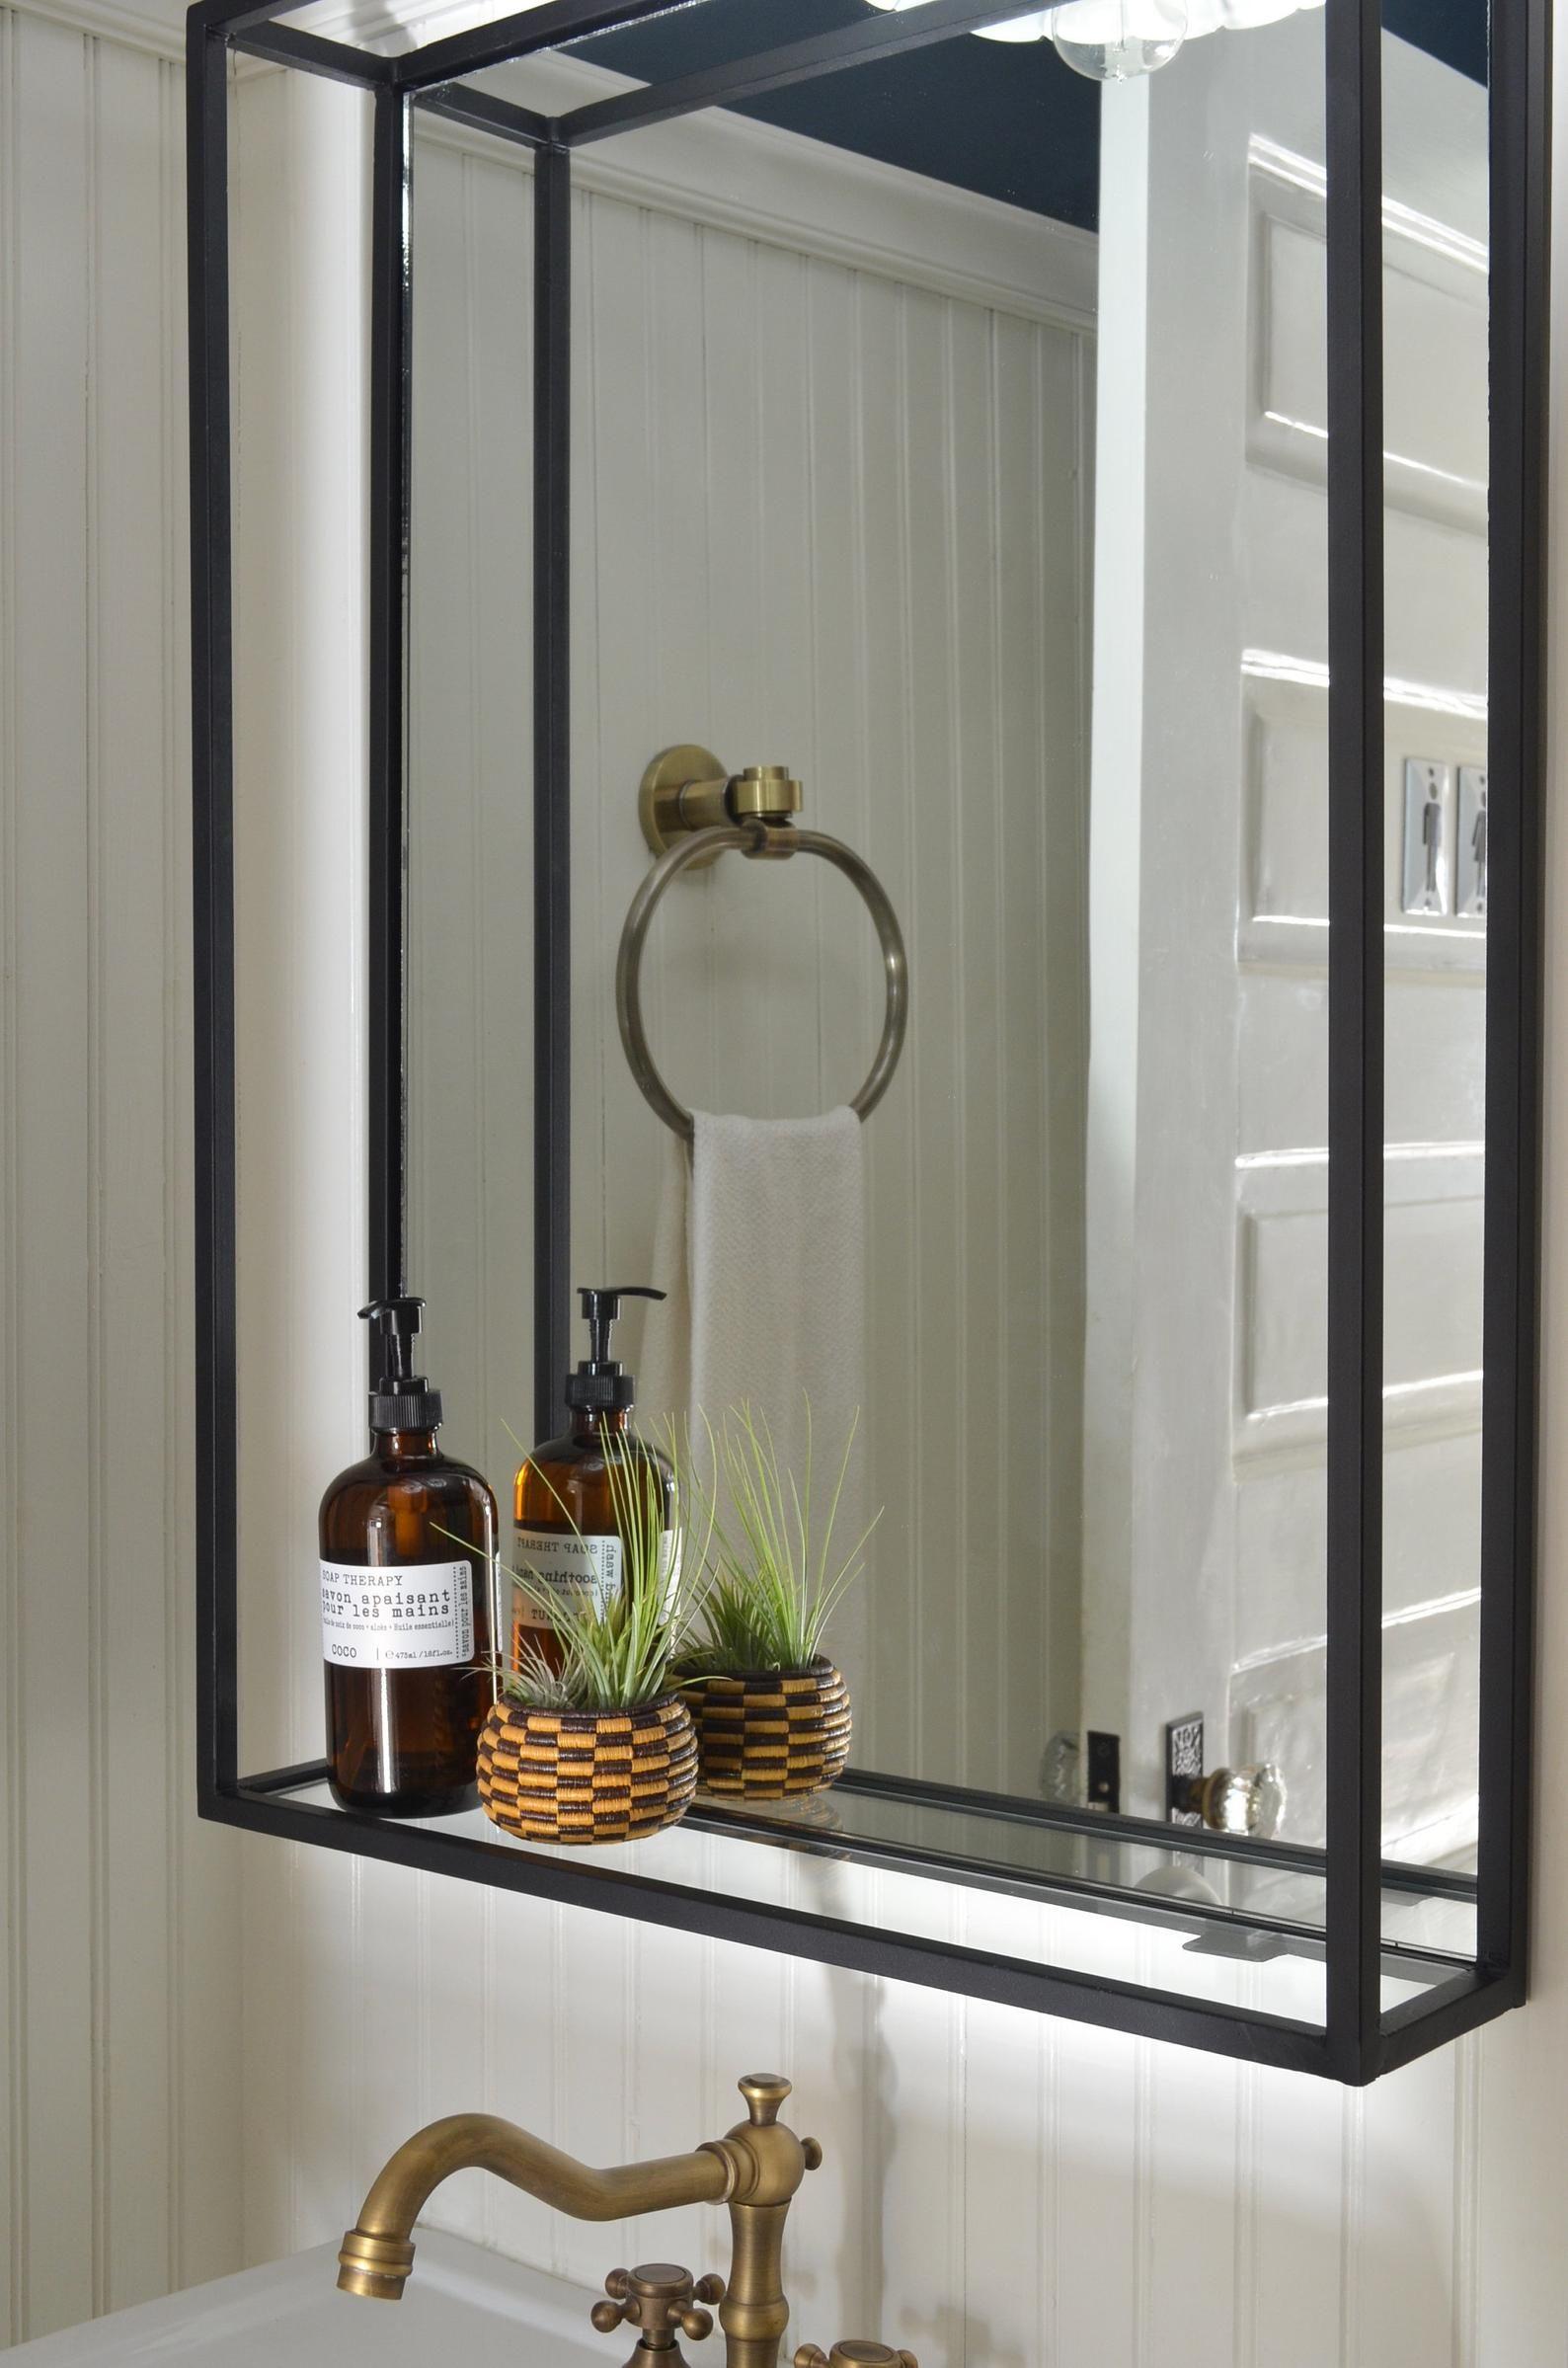 Bathroom Shelf Mirror Modern Industrial Black Steel Metal Framed